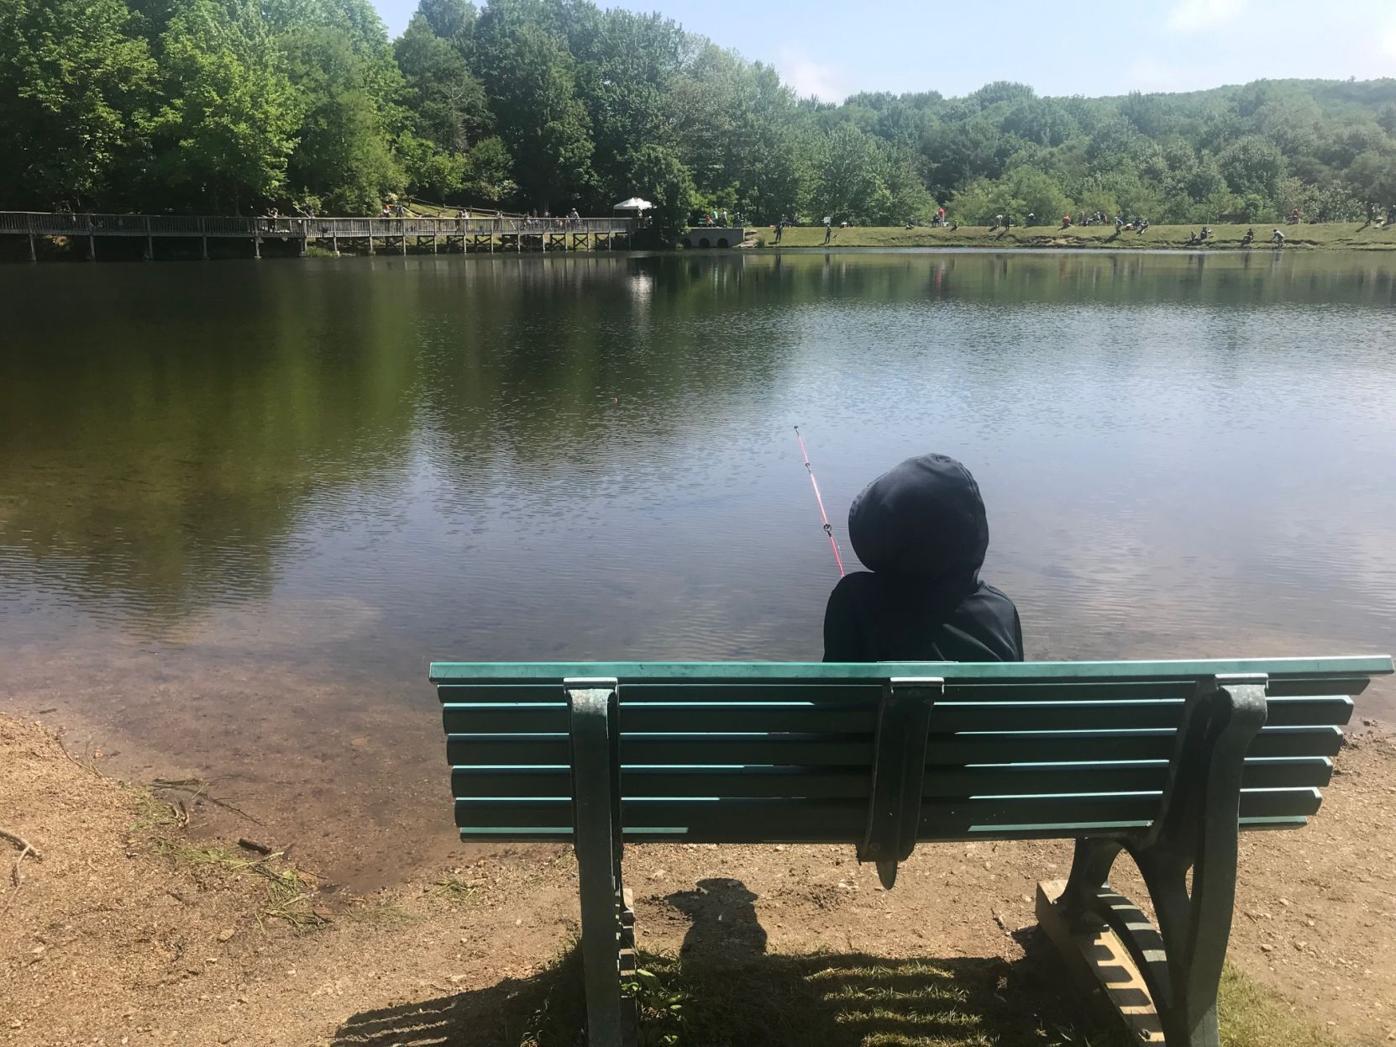 Girl fishing on bench